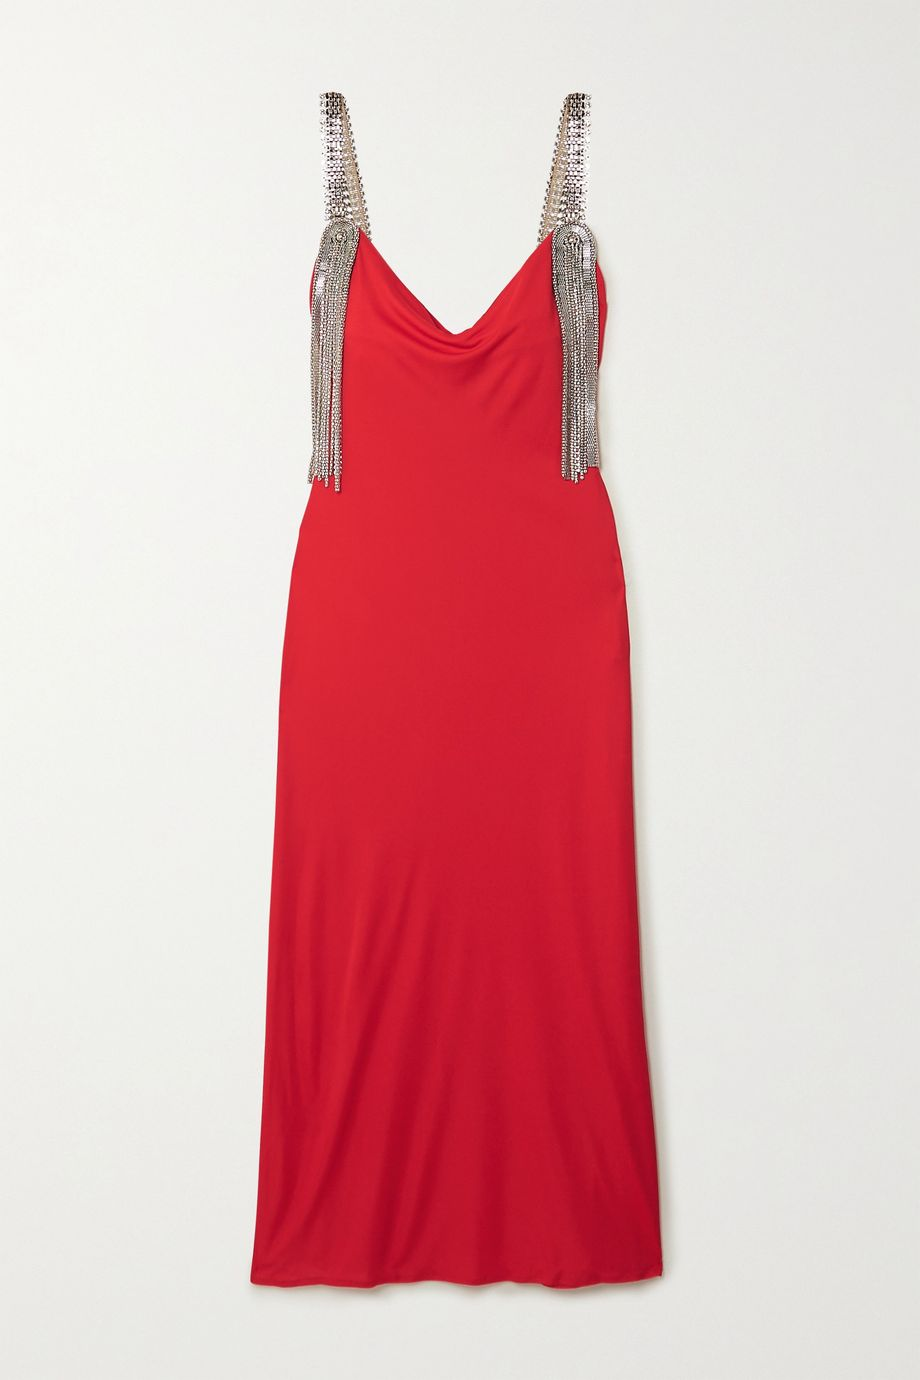 Christopher Kane Embellished jersey midi dress